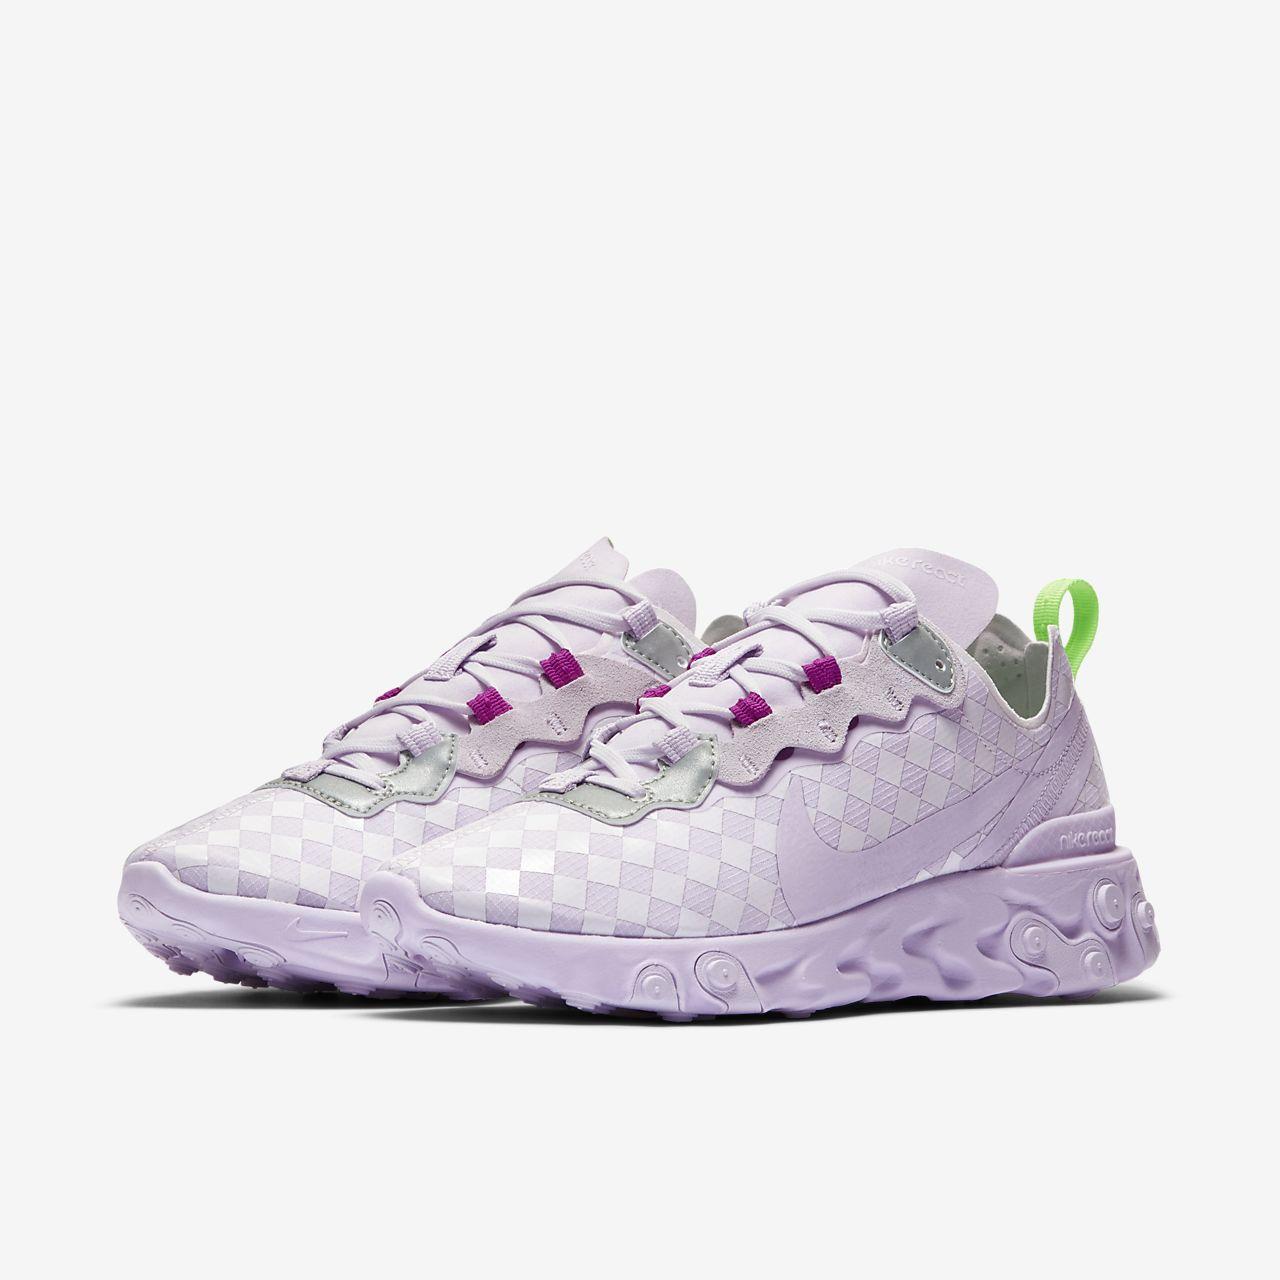 Damier À 55 Pour Chaussure Nike React Element Femme 9EWDH2I